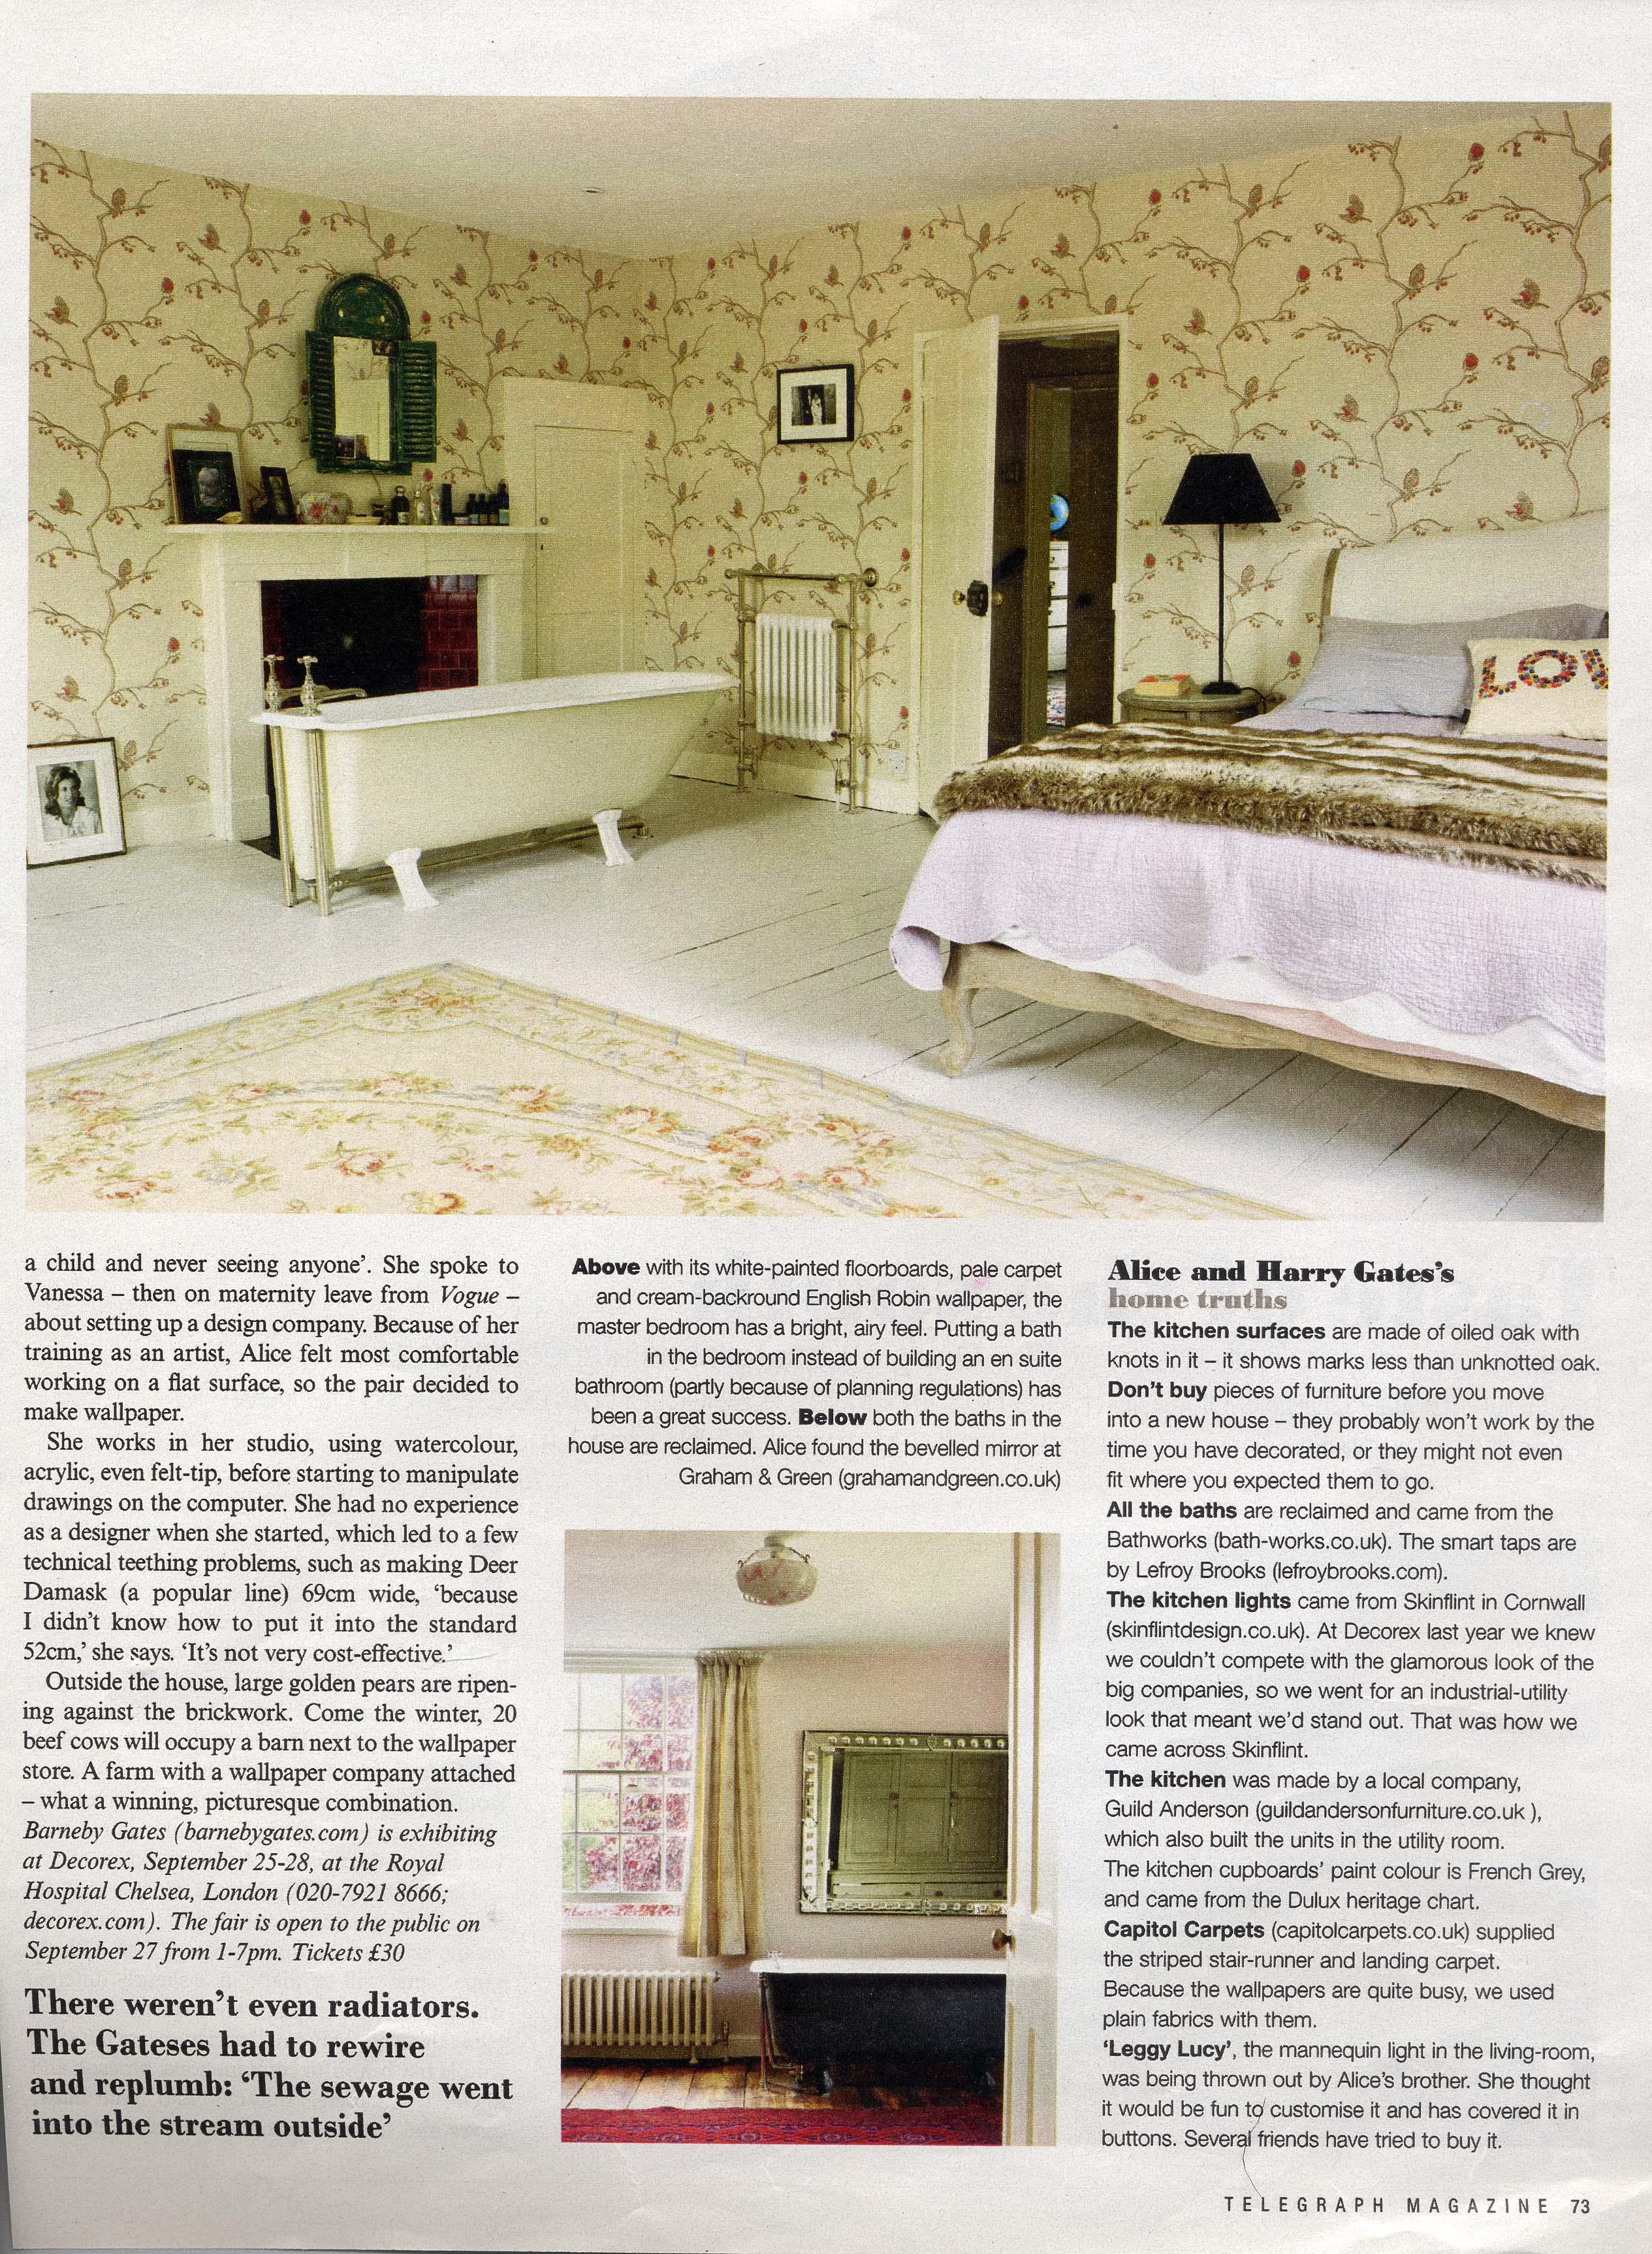 2011 Sept - Telegraph Magazine - page 5